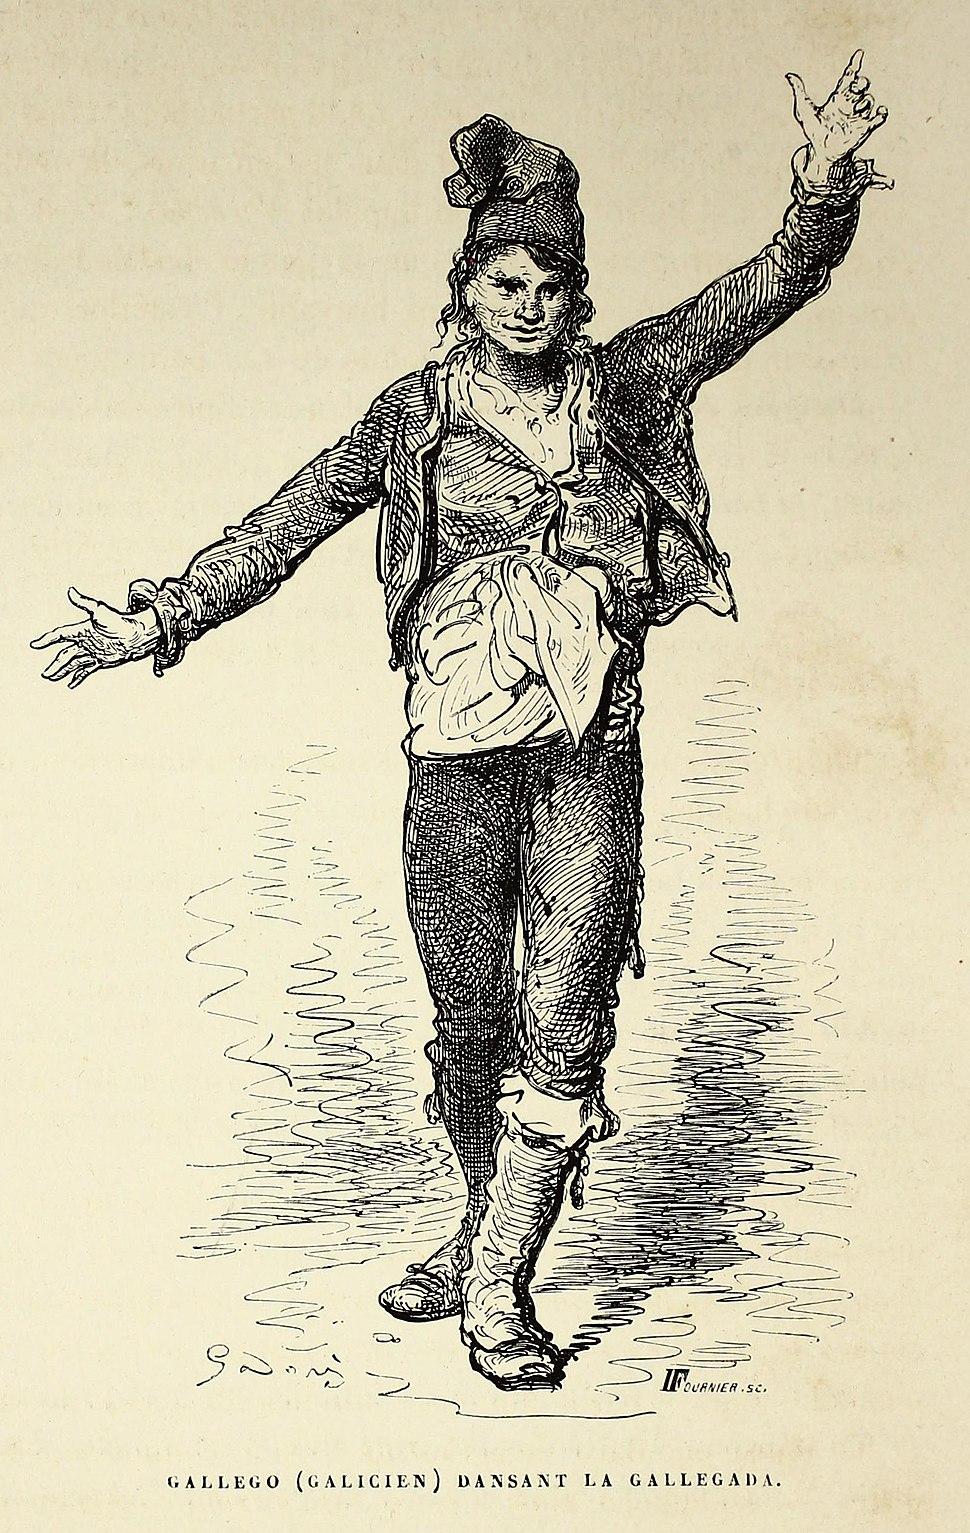 """Gallego (galicien) dansant la gallegada"" (19749113588)"